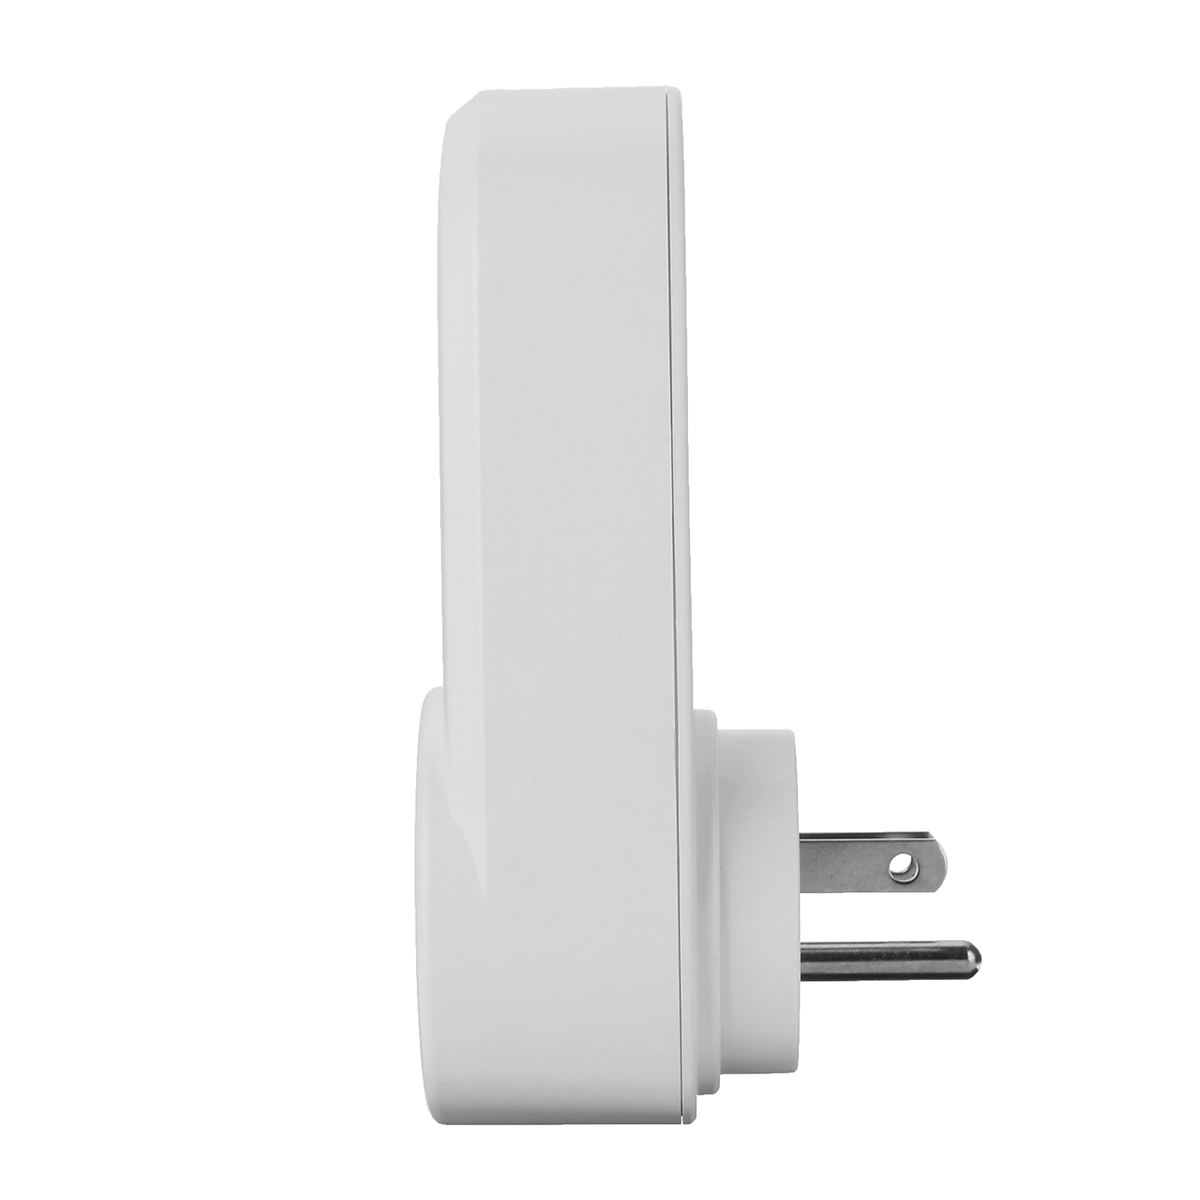 LEORY US/UK/EU Dual USB 10A Smart Wifi Plug Power Socket Timer APP Remote Control For ALEXA GOOGLE HOME